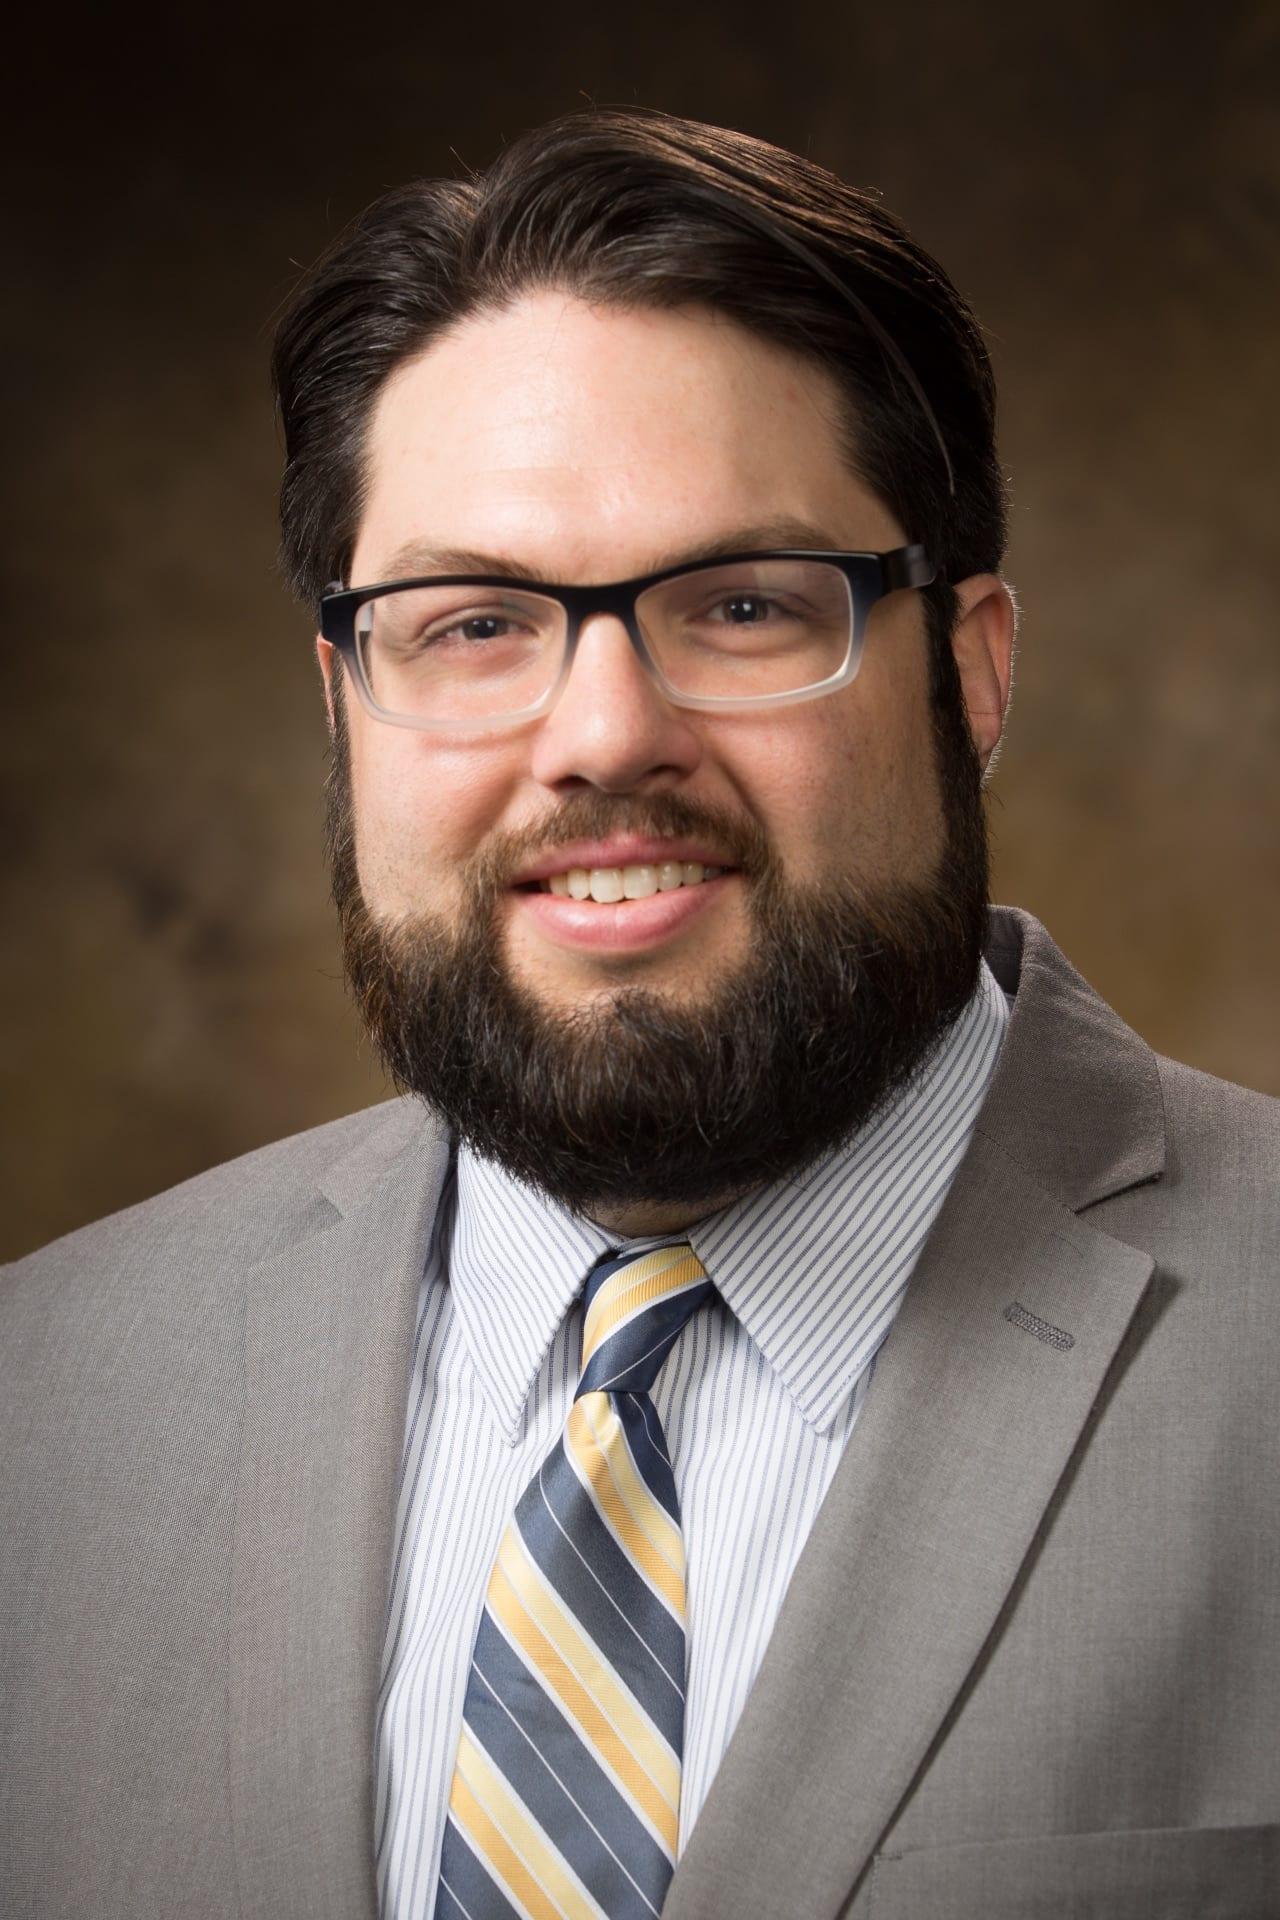 Marino to Kick Off Libraries' Spring Graduate Speaker Series Feb. 7